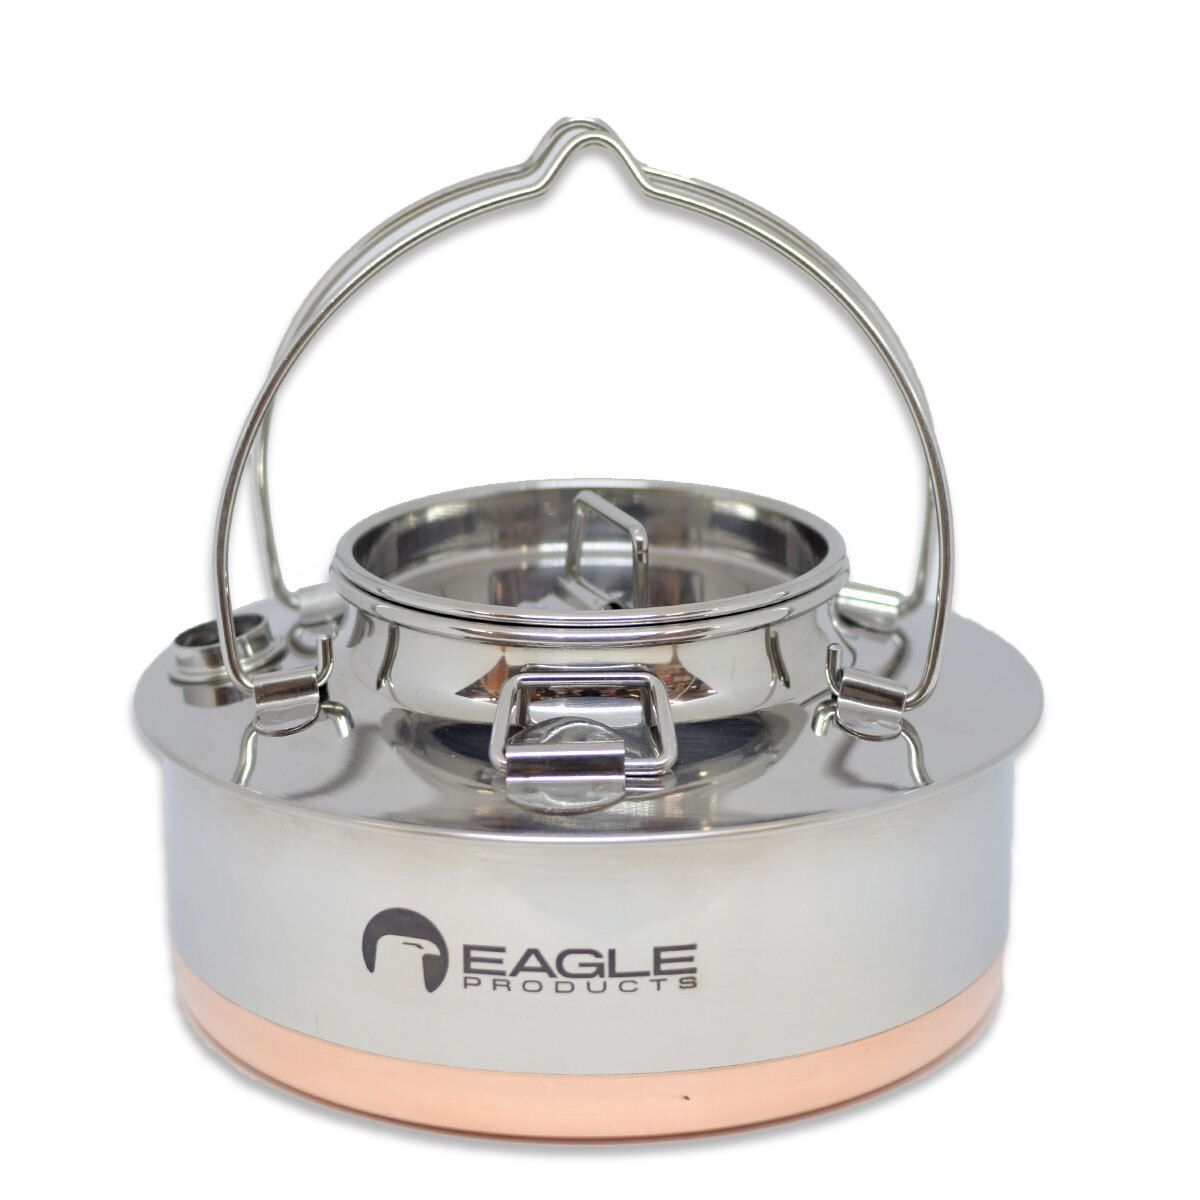 EAGLE PRODUCTS キャンプファイヤーケトル 0.7L